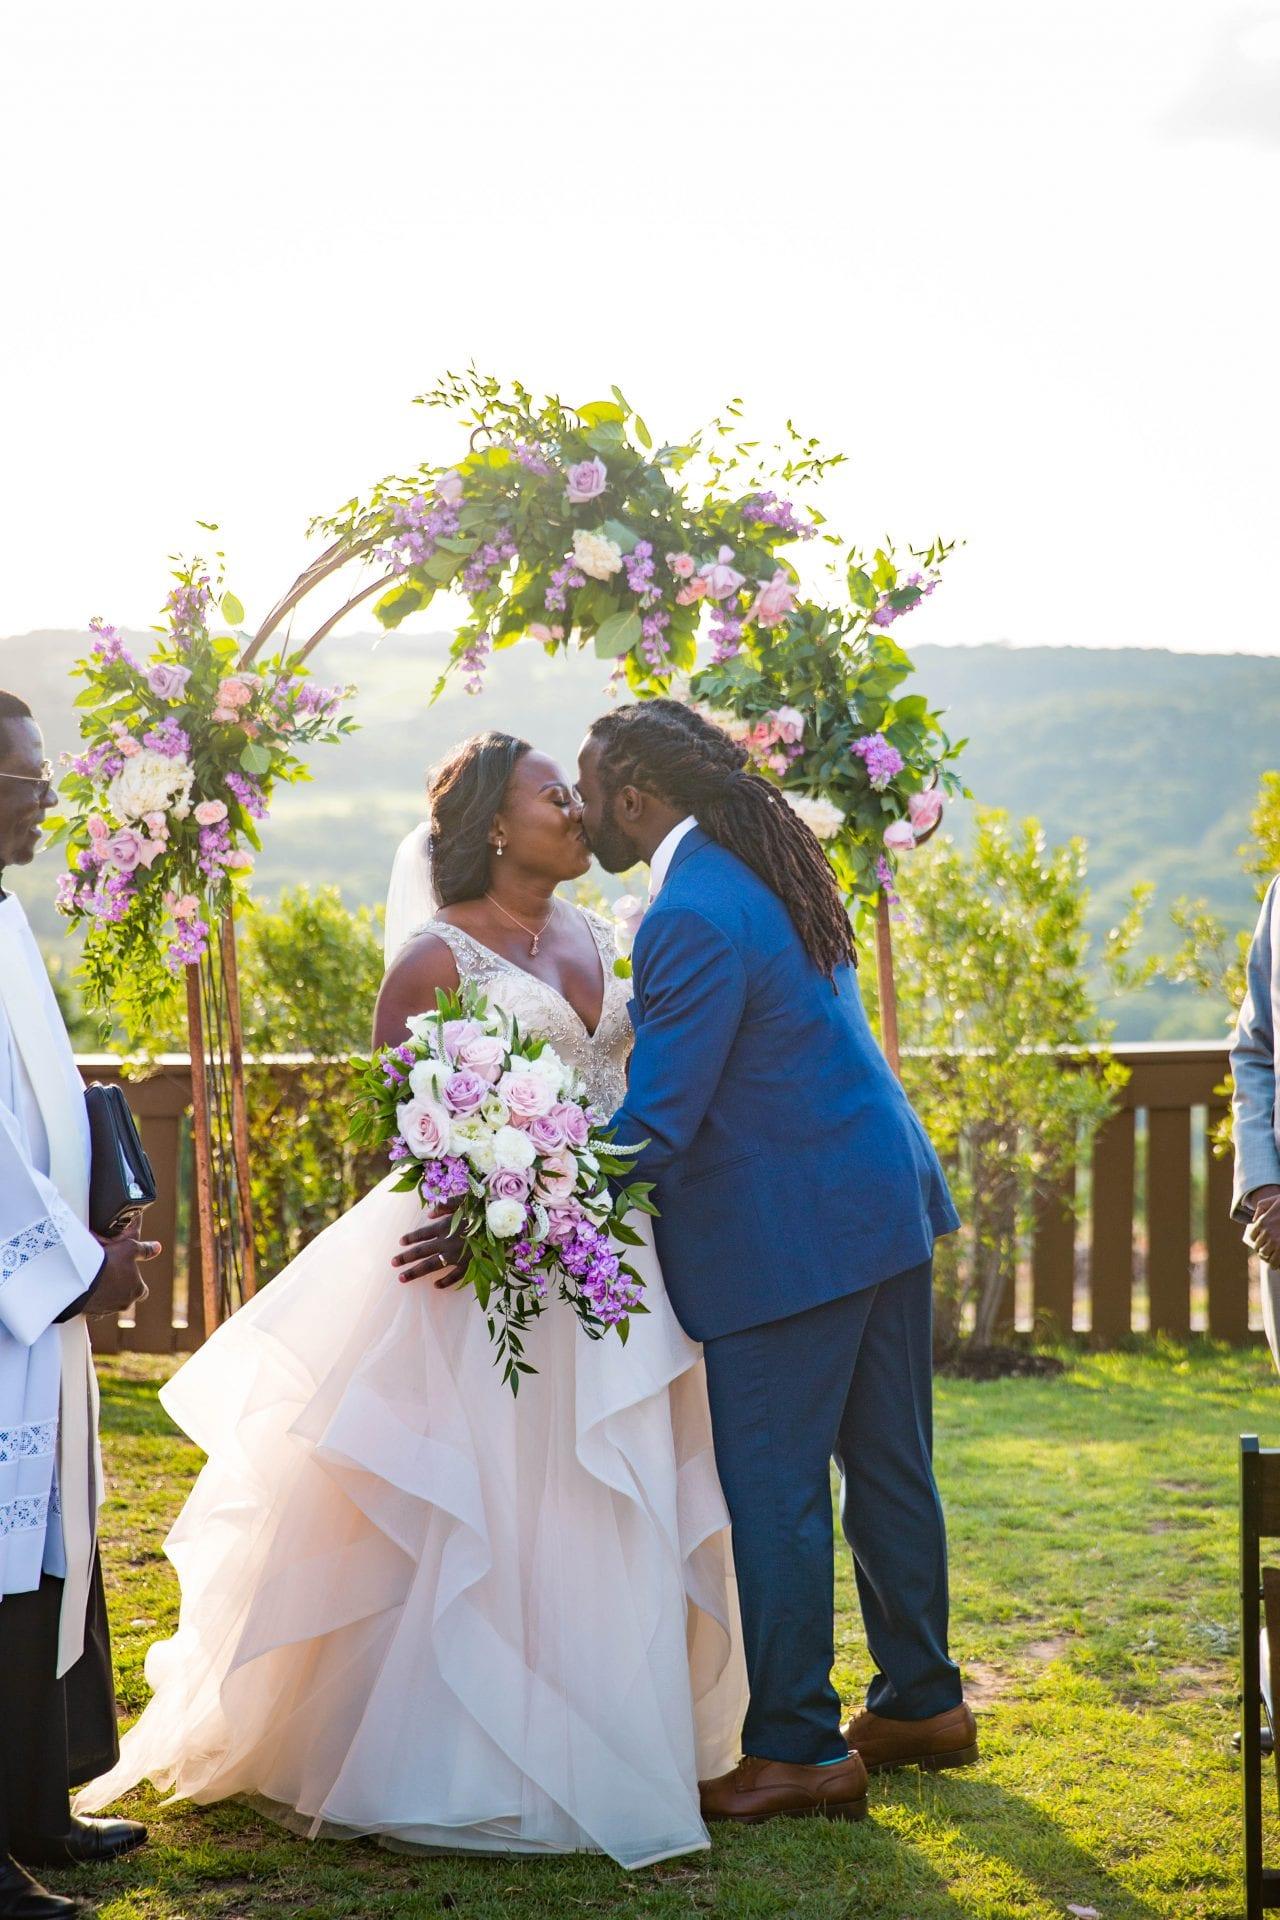 Onyema wedding La Cantera the kiss